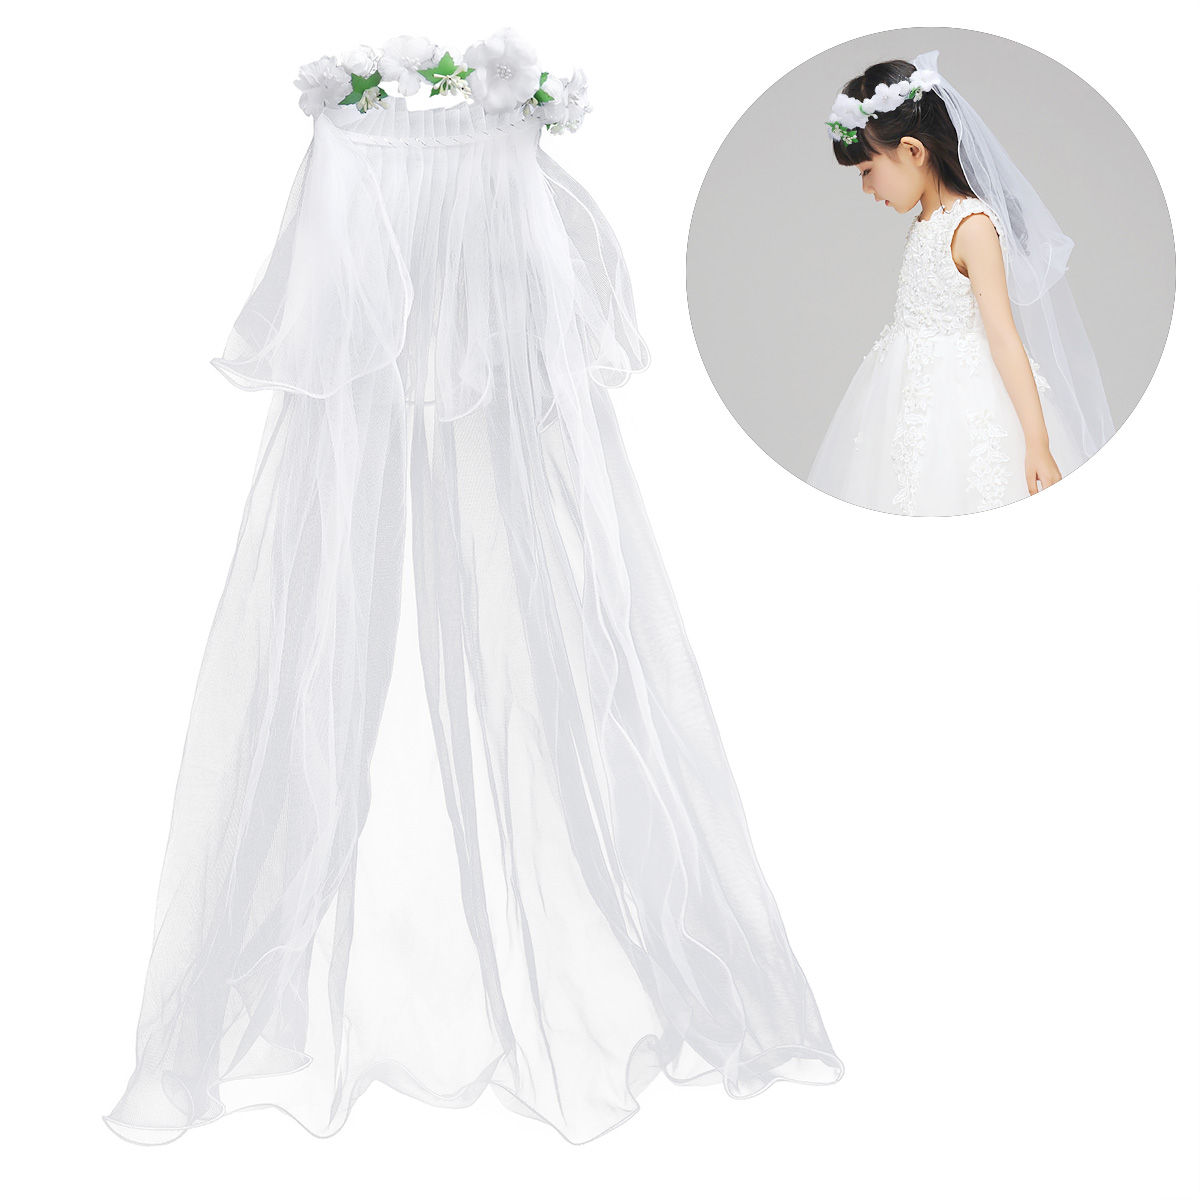 White Flower Girl Veils Two Layers White Wedding Communion Hair Wreath Wedding Accessories